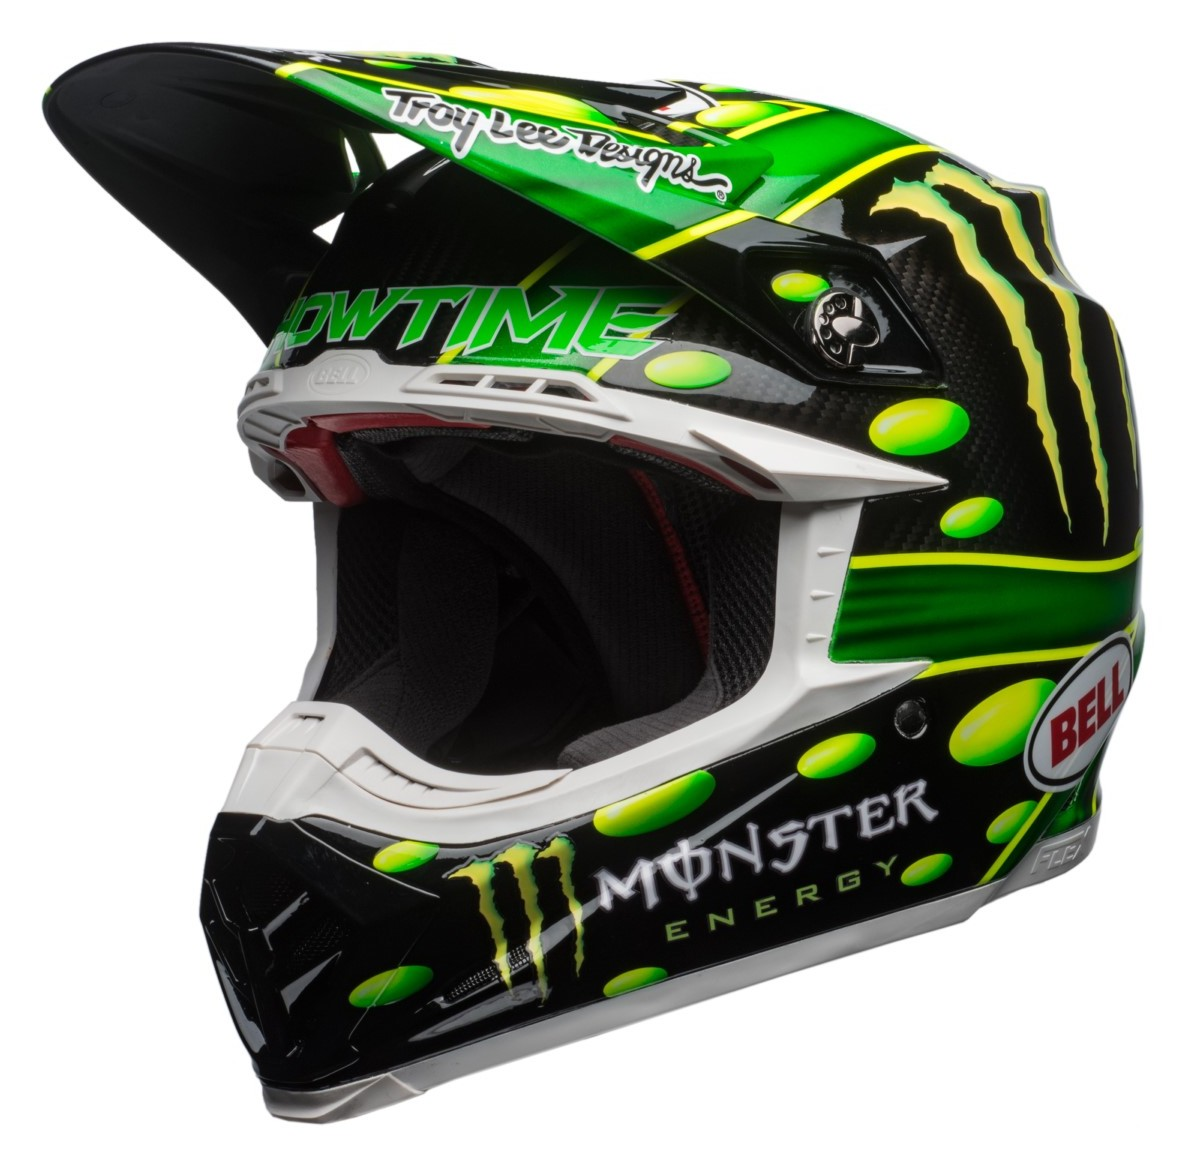 Bell Moto 9 Flex Helmet >> Bell Moto-9 Carbon Flex MC Monster Replica 2018 Helmet - Cycle Gear